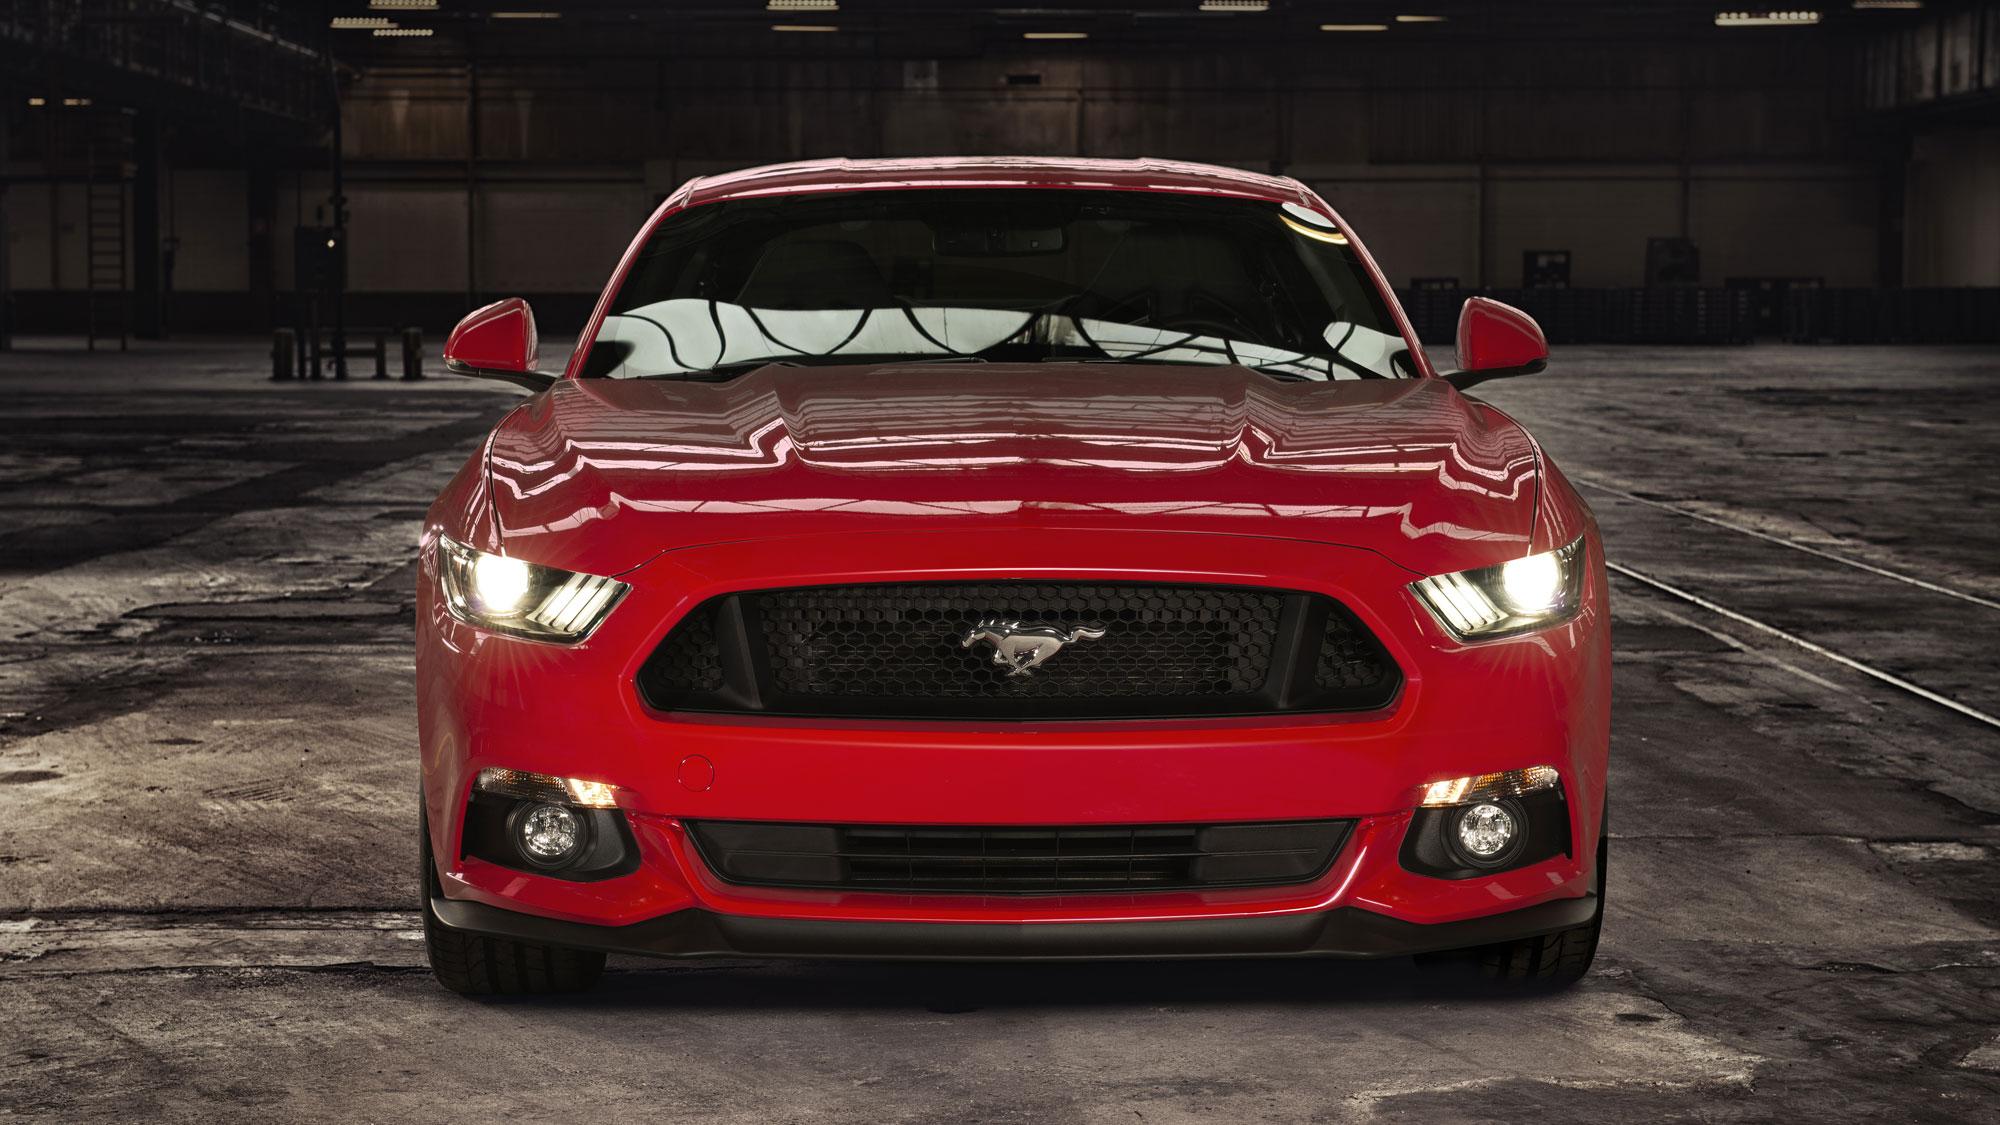 FordGeneva2015_Mustang_05.jpg